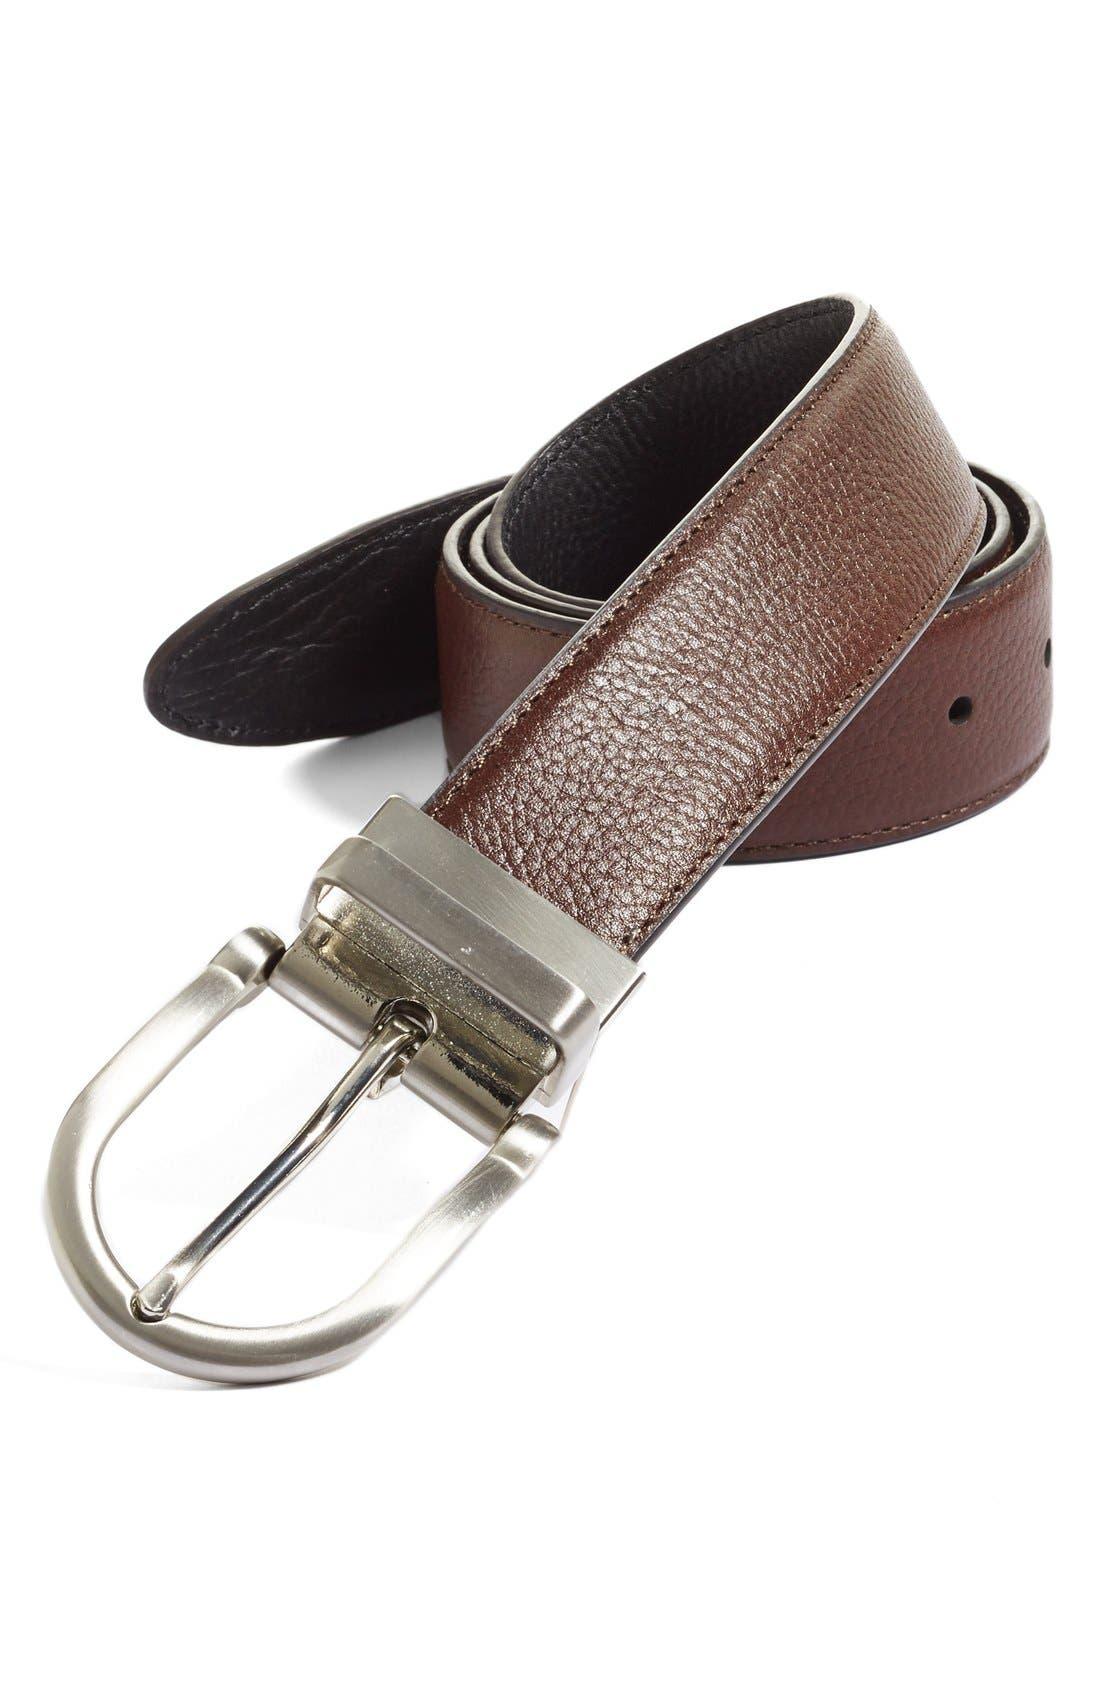 Main Image - Nordstrom Reversible Leather Belt